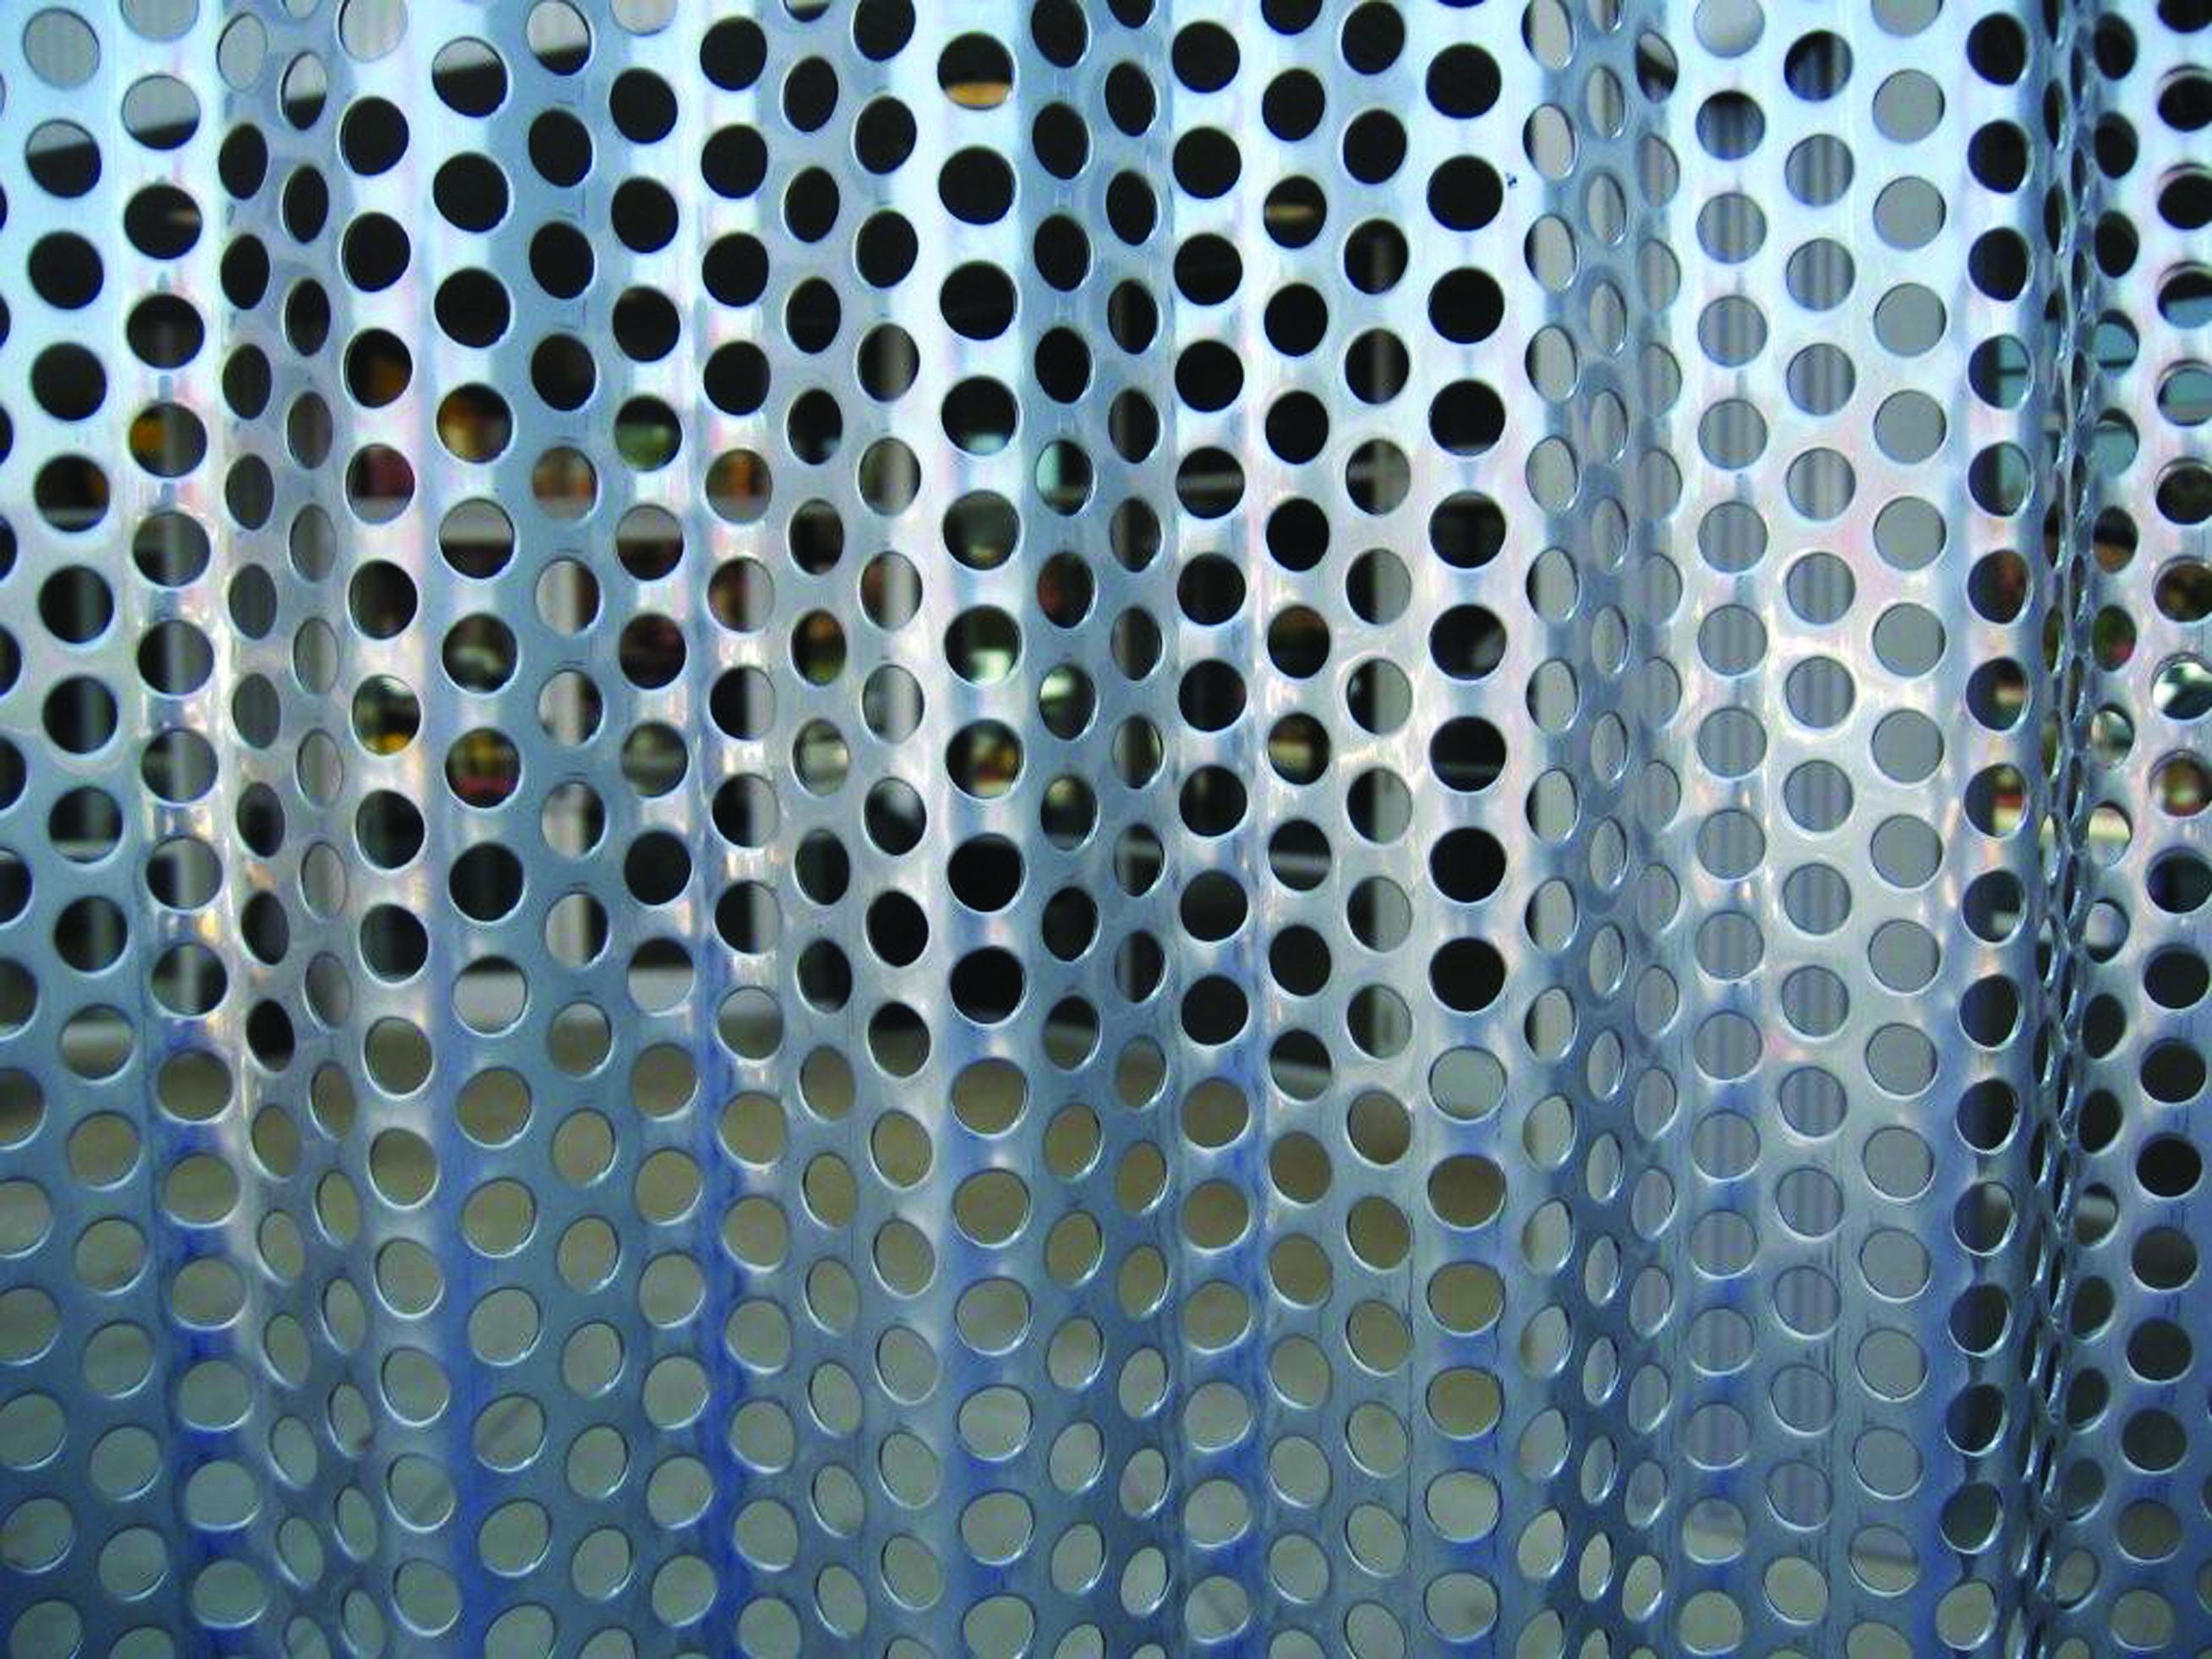 Gaten Series A Perforated Metal Panel By Atas Atas